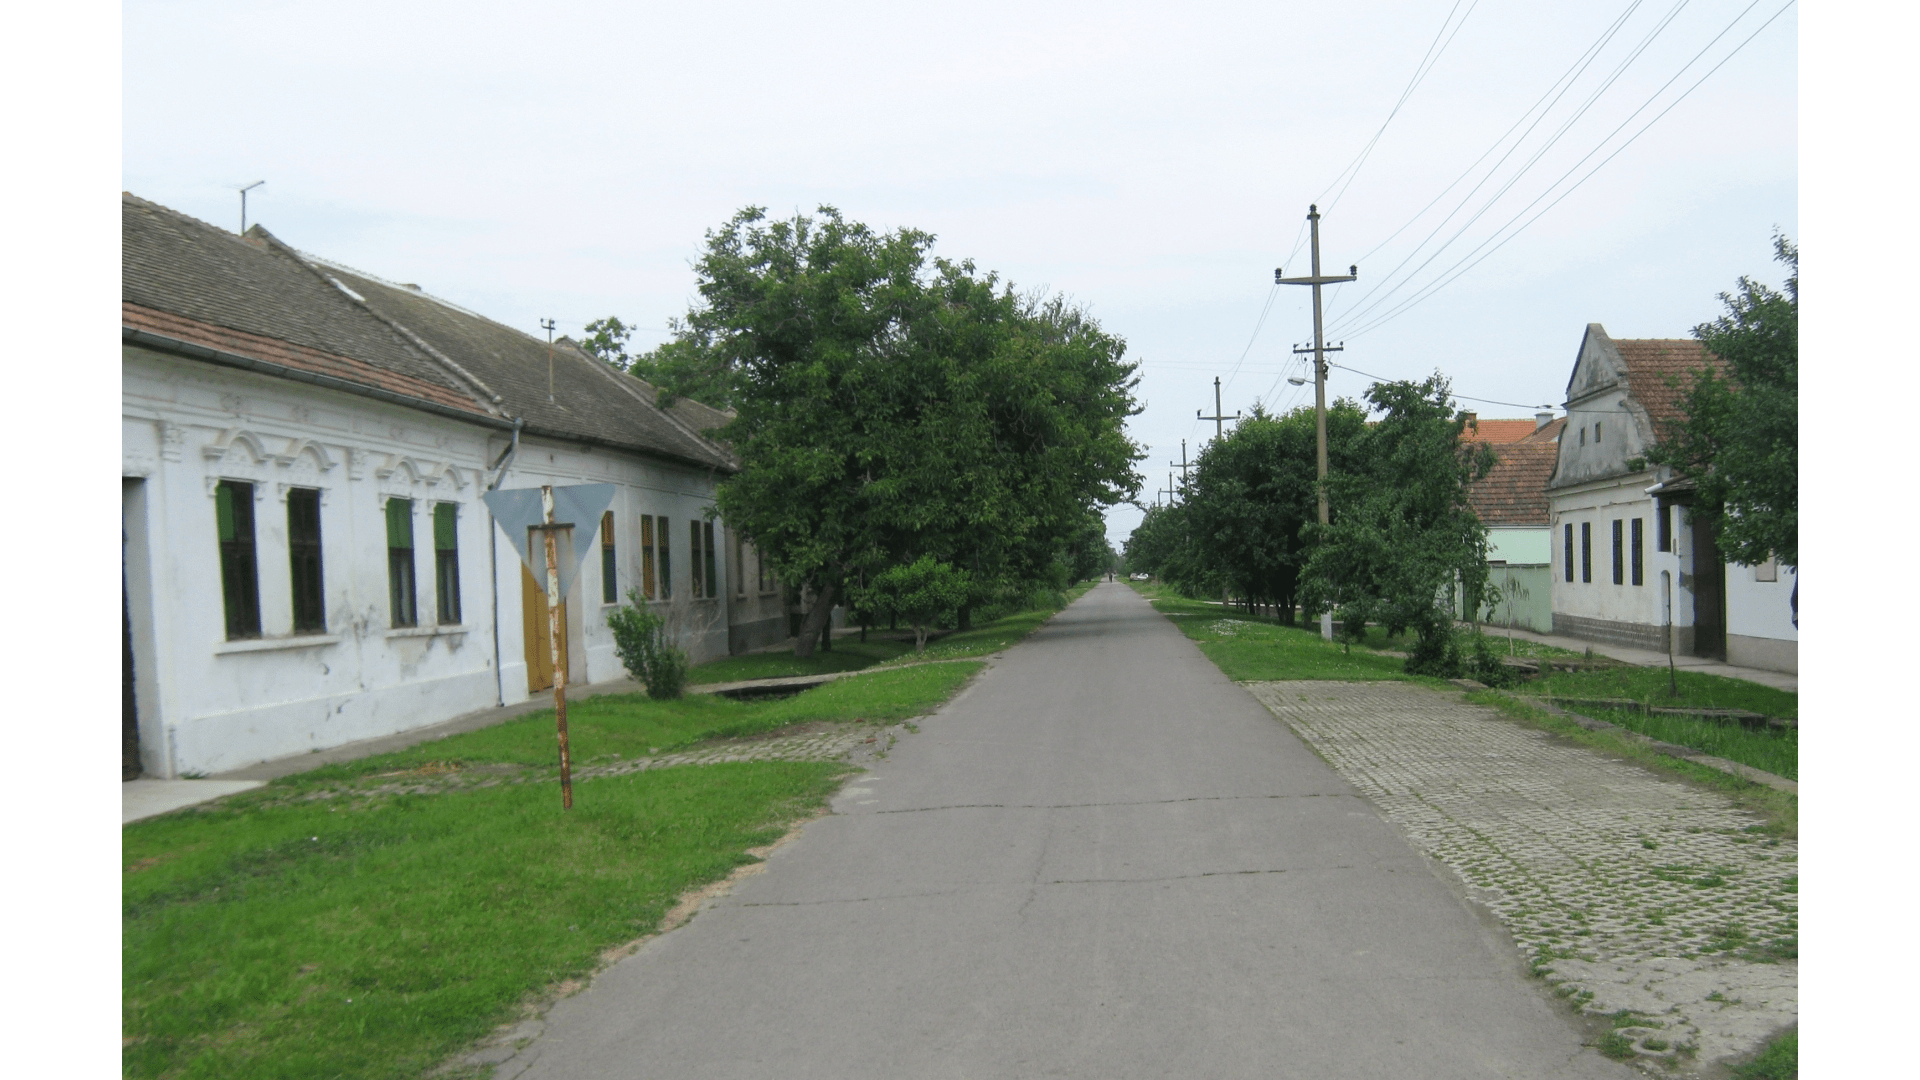 Straßenbild in Filipowa 2013. Foto: Archiv Freundeskreis Filipowa